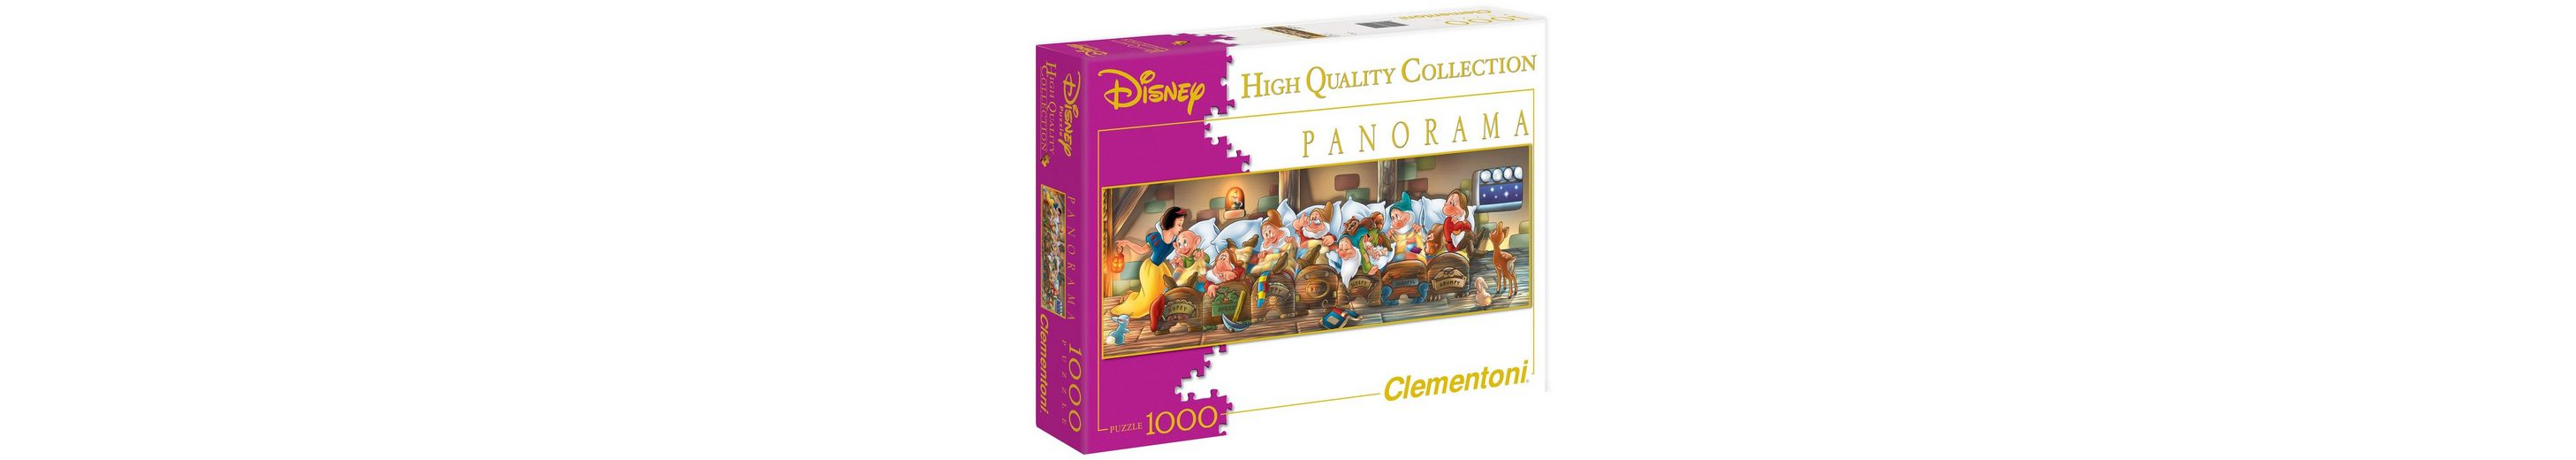 Clementoni Panorama-Puzzle, 1000 Teile, »Disney, Biancaneve«